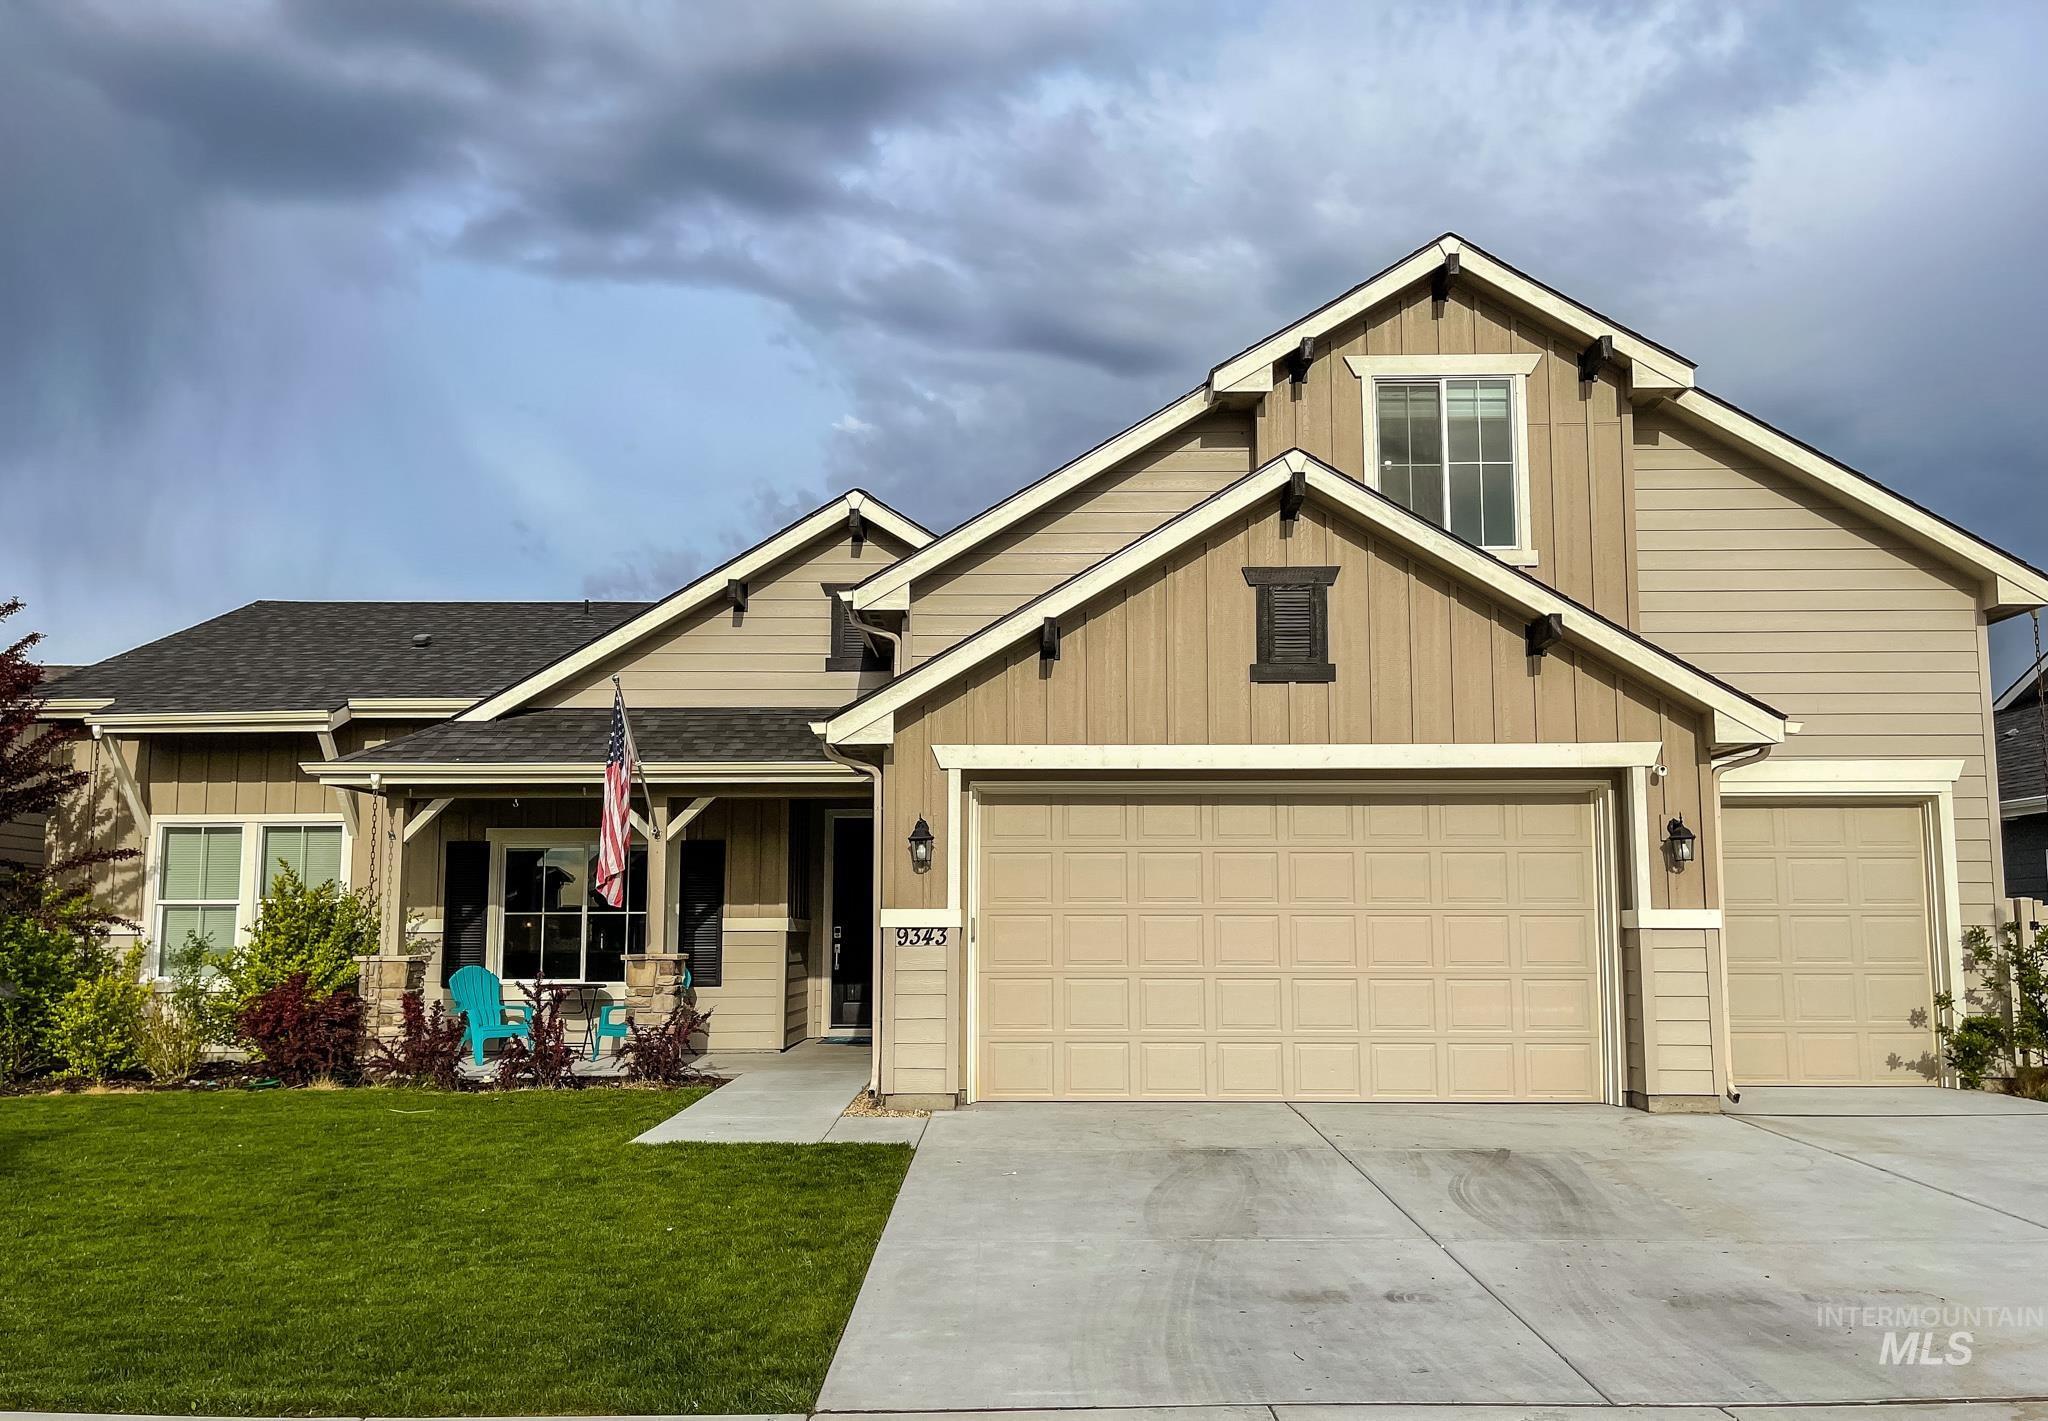 9343 S Fidalgo Property Photo - Kuna, ID real estate listing